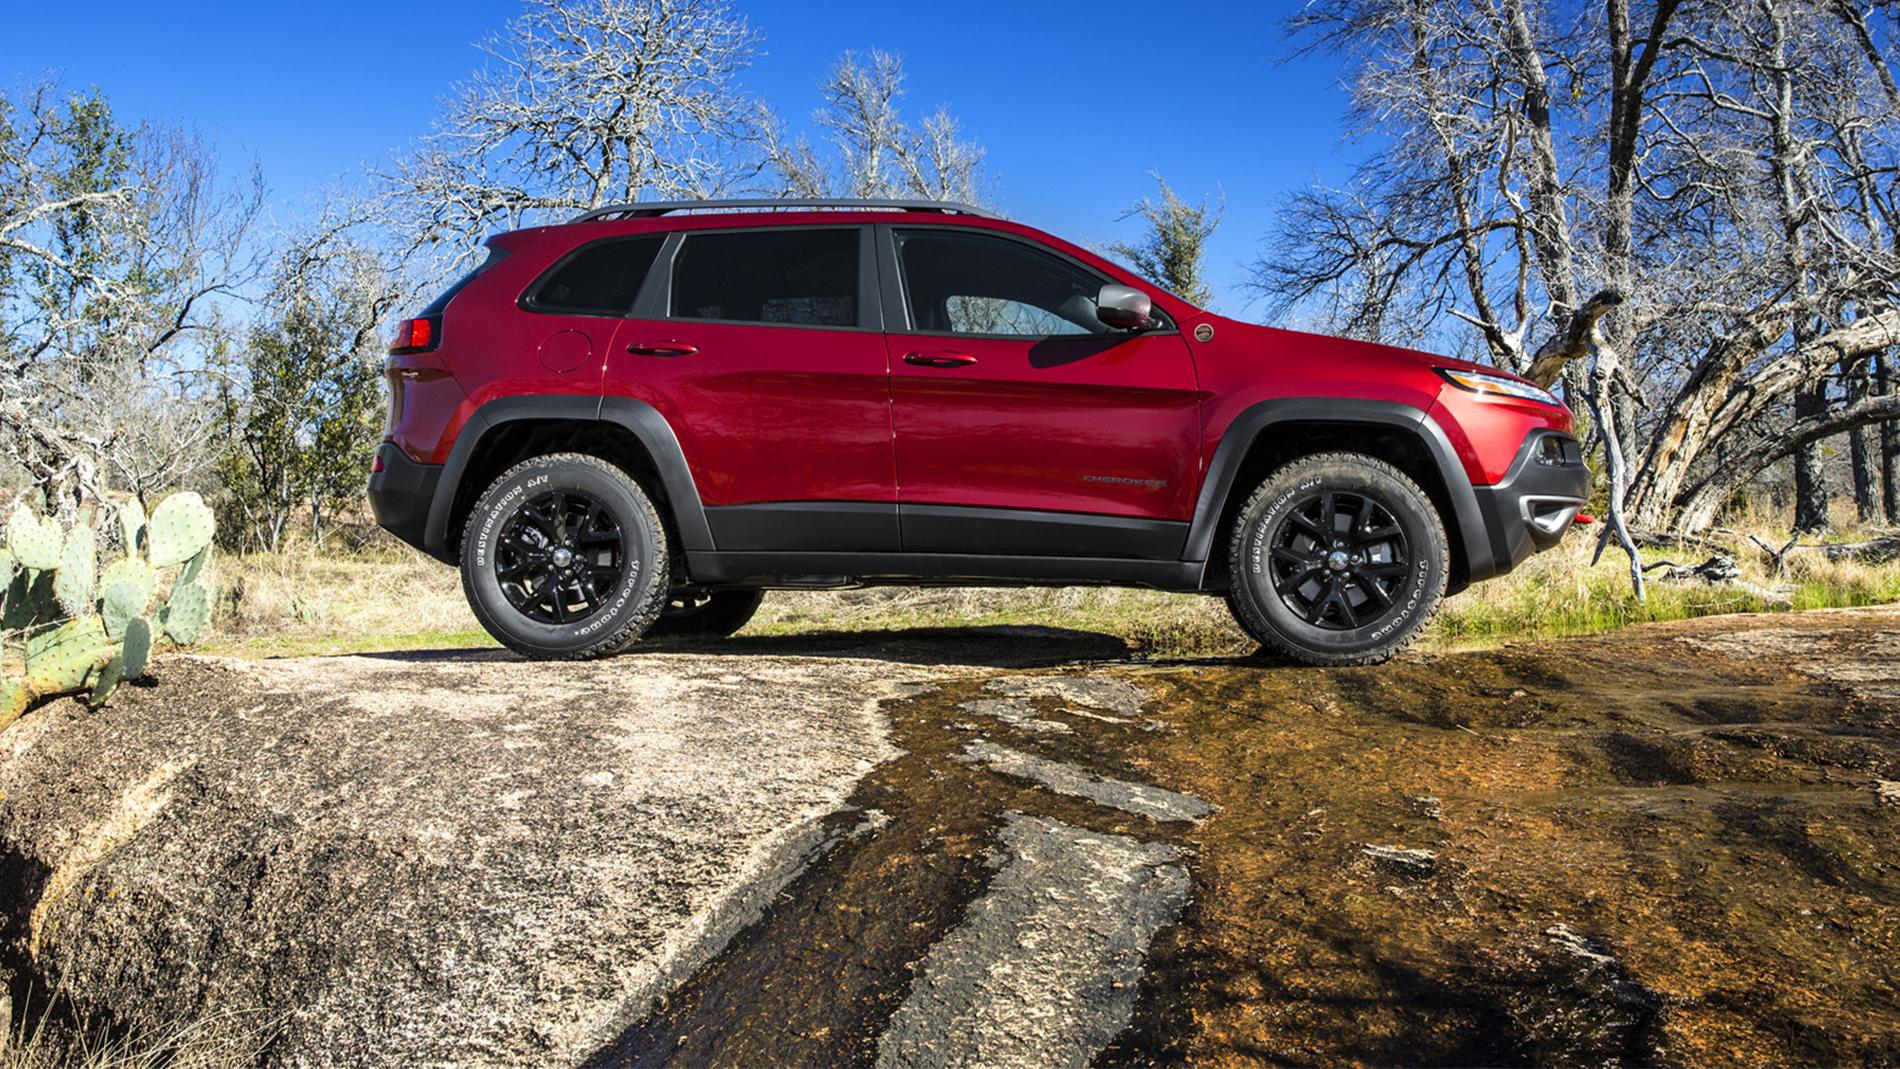 New 2019 Jeep Cherokee | Quirk Chrysler Jeep near Boston MA